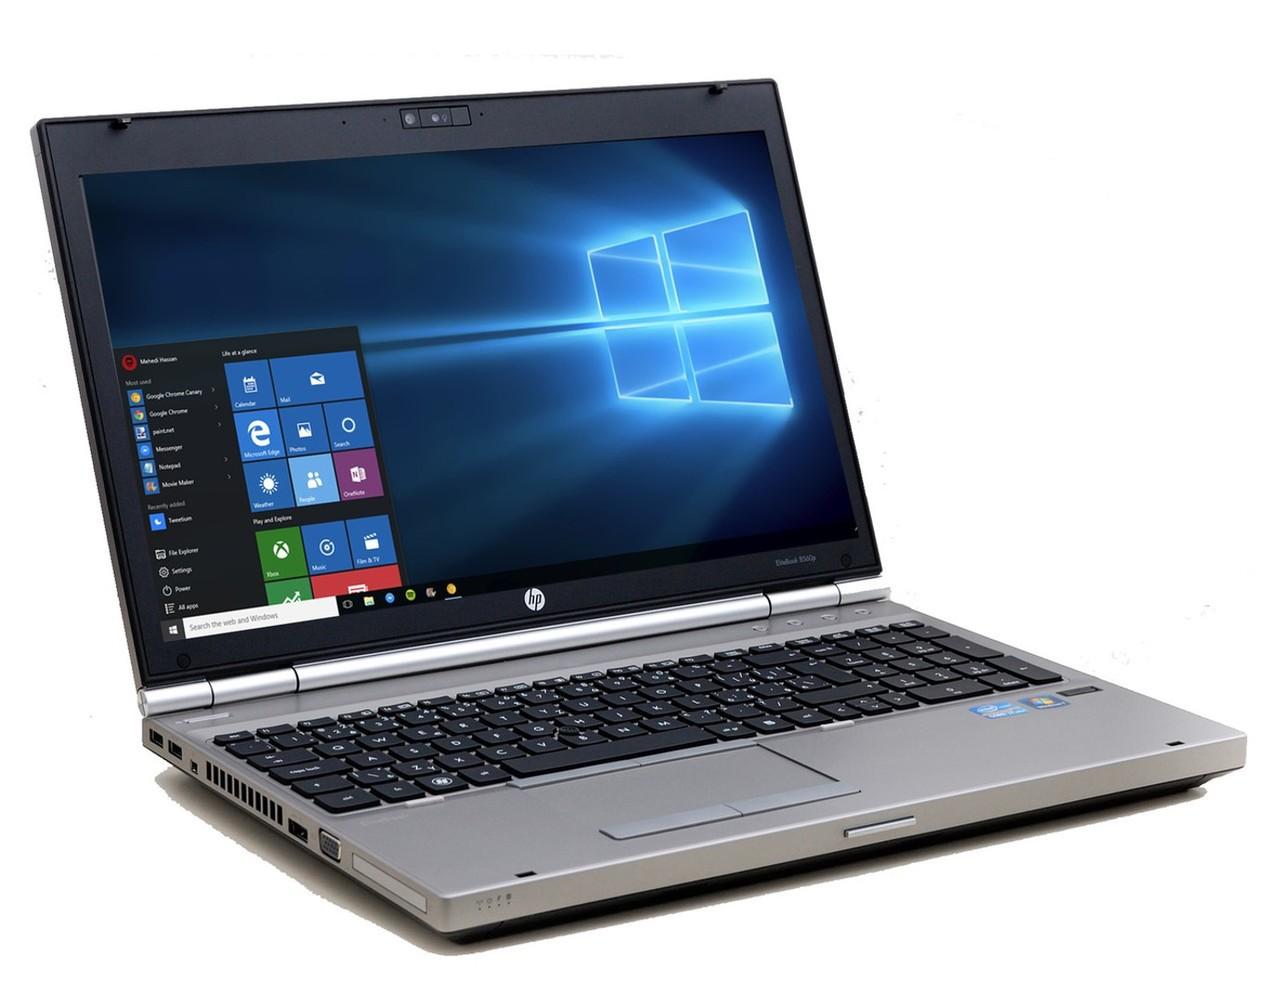 HP EliteBook 8560p – هارد 320 جيجا و رام 8 جيجا – كارت شاشة AMD 6470m 1GB